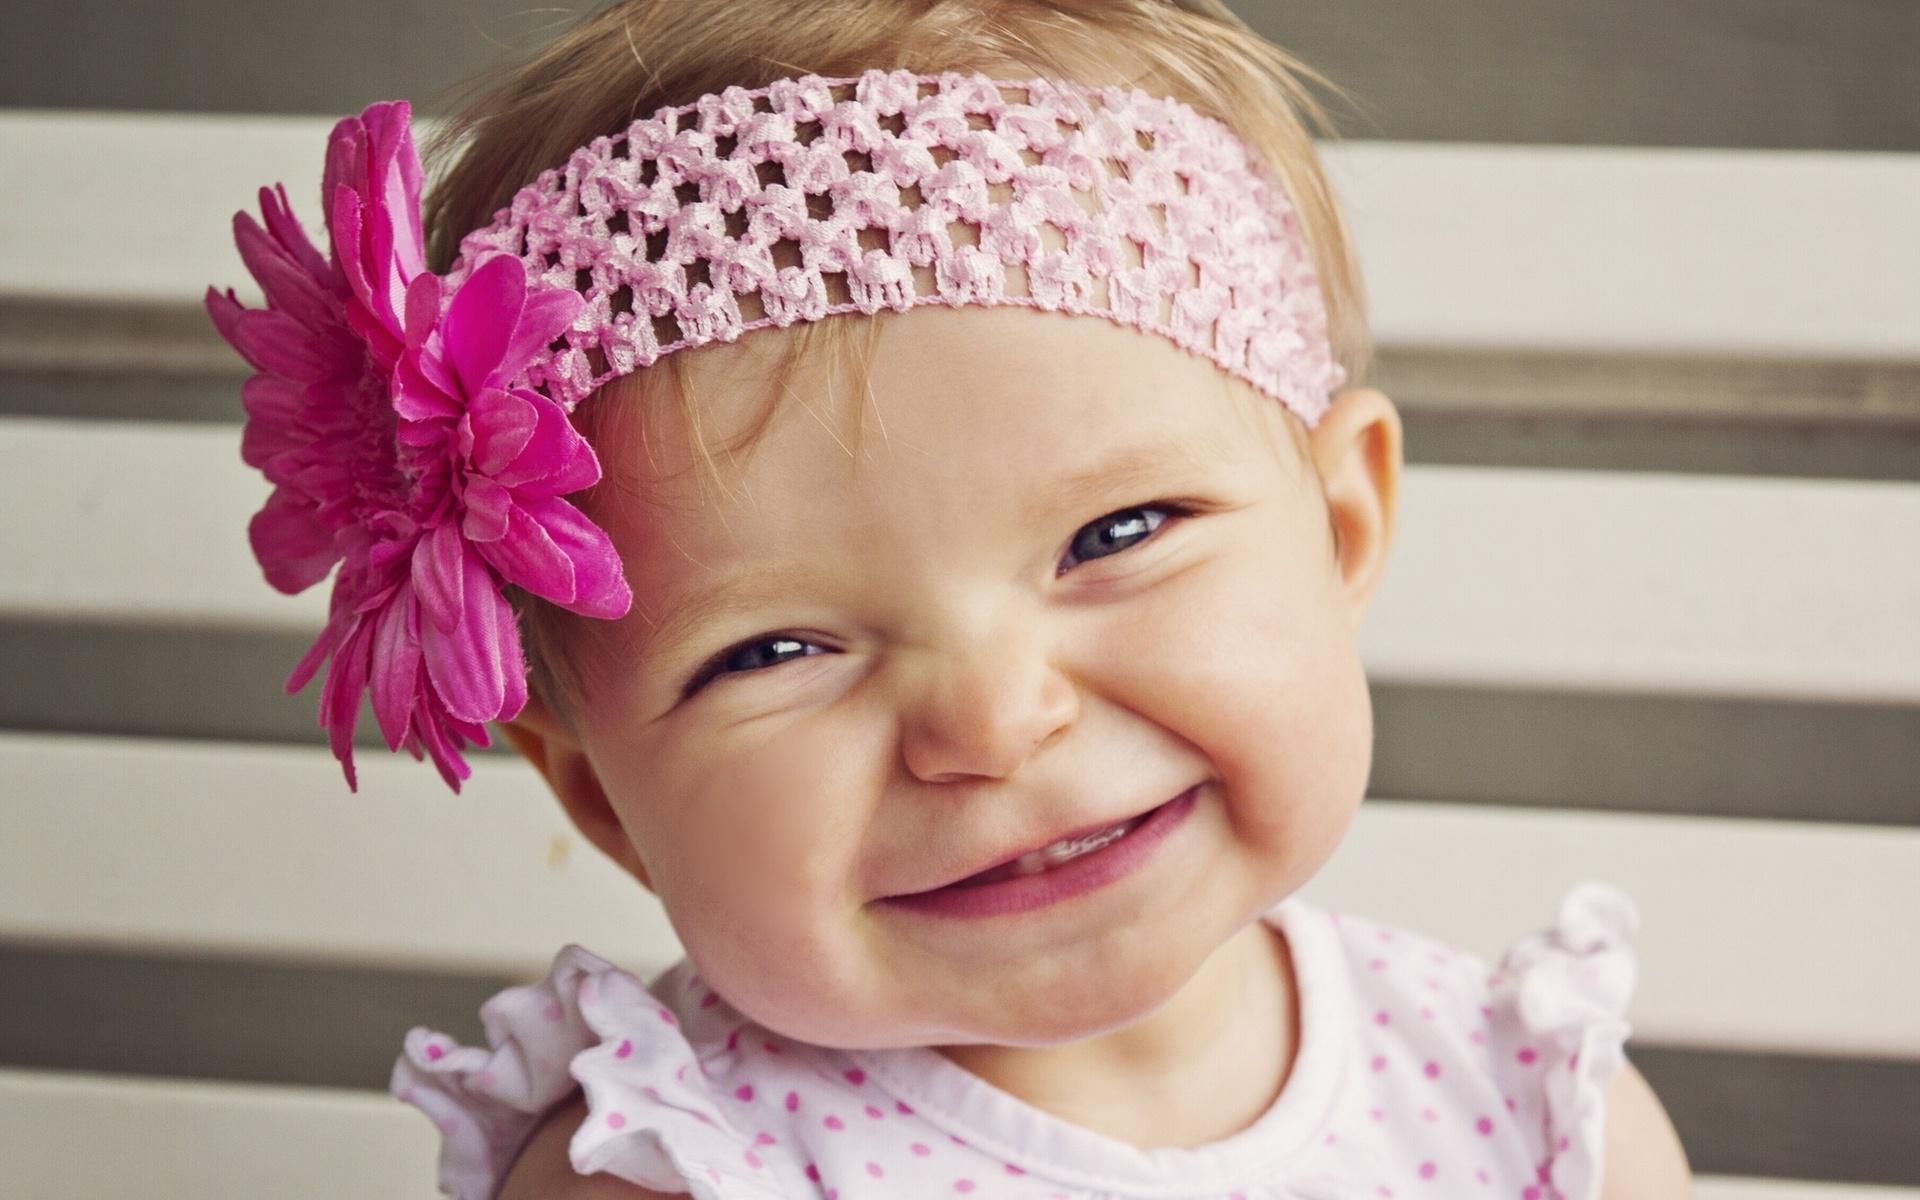 Cute Baby Girl Smile Desktop Wallpaper 1920x1200